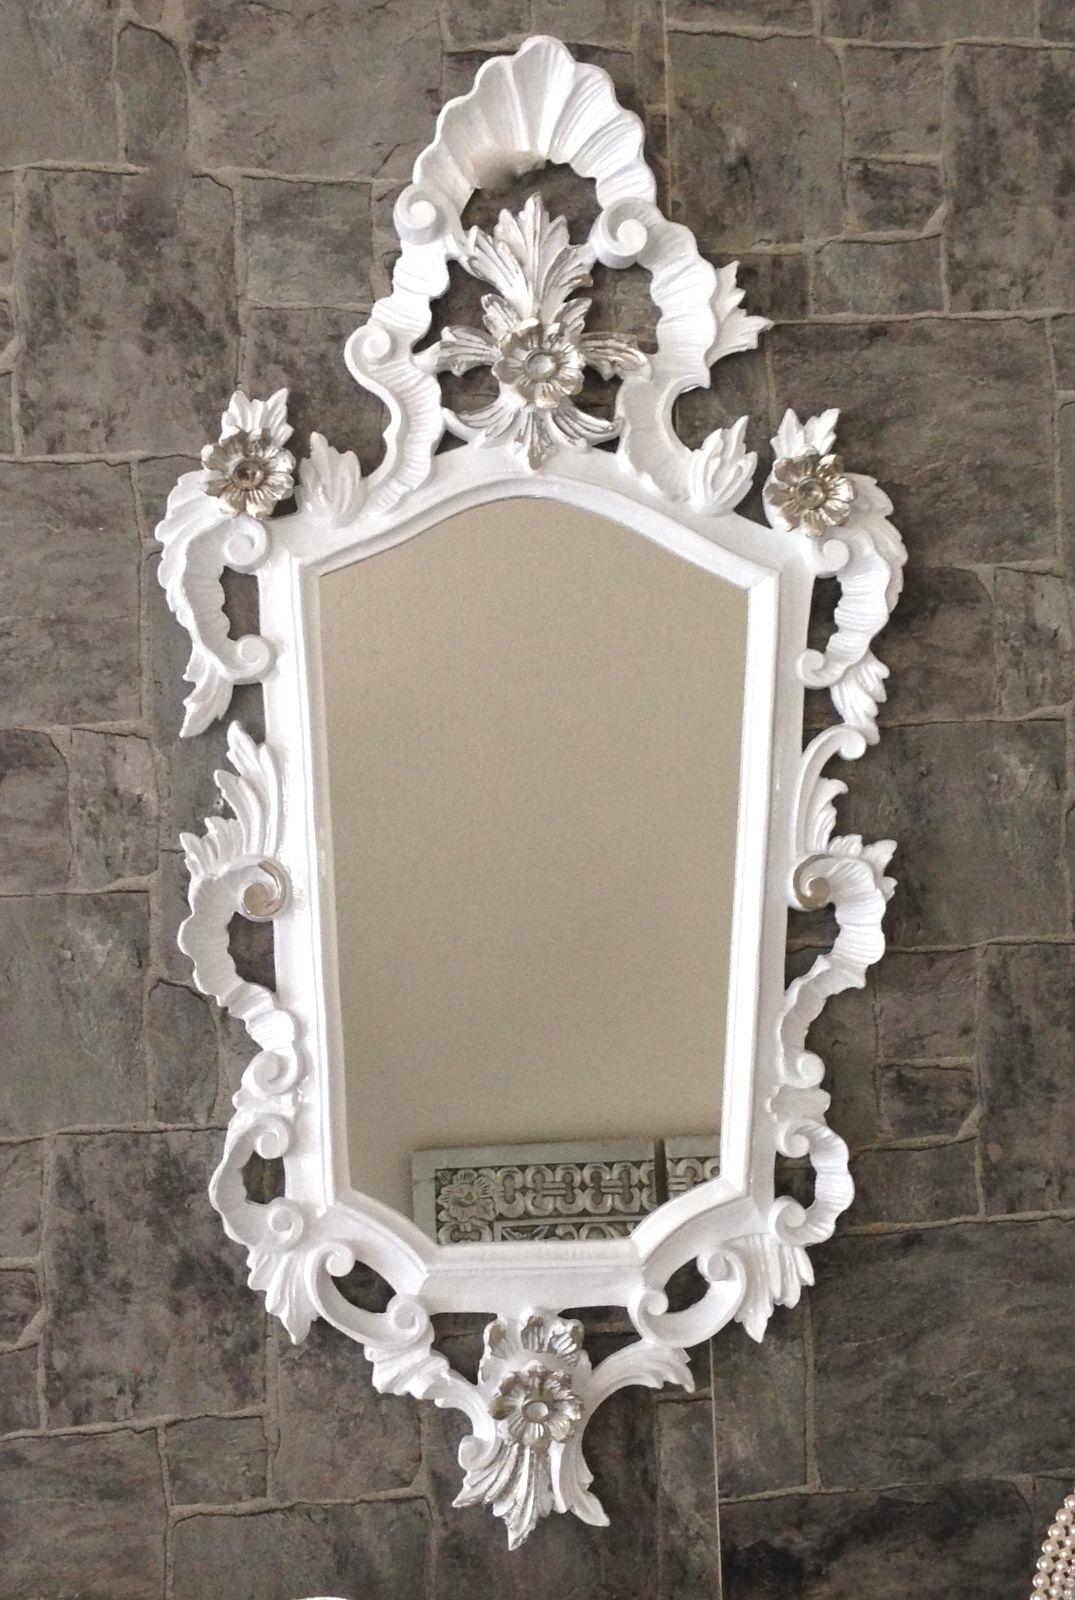 Wandspiegel Barock Weiss Silber Spiegel Antik Badspiegel Barspiegel